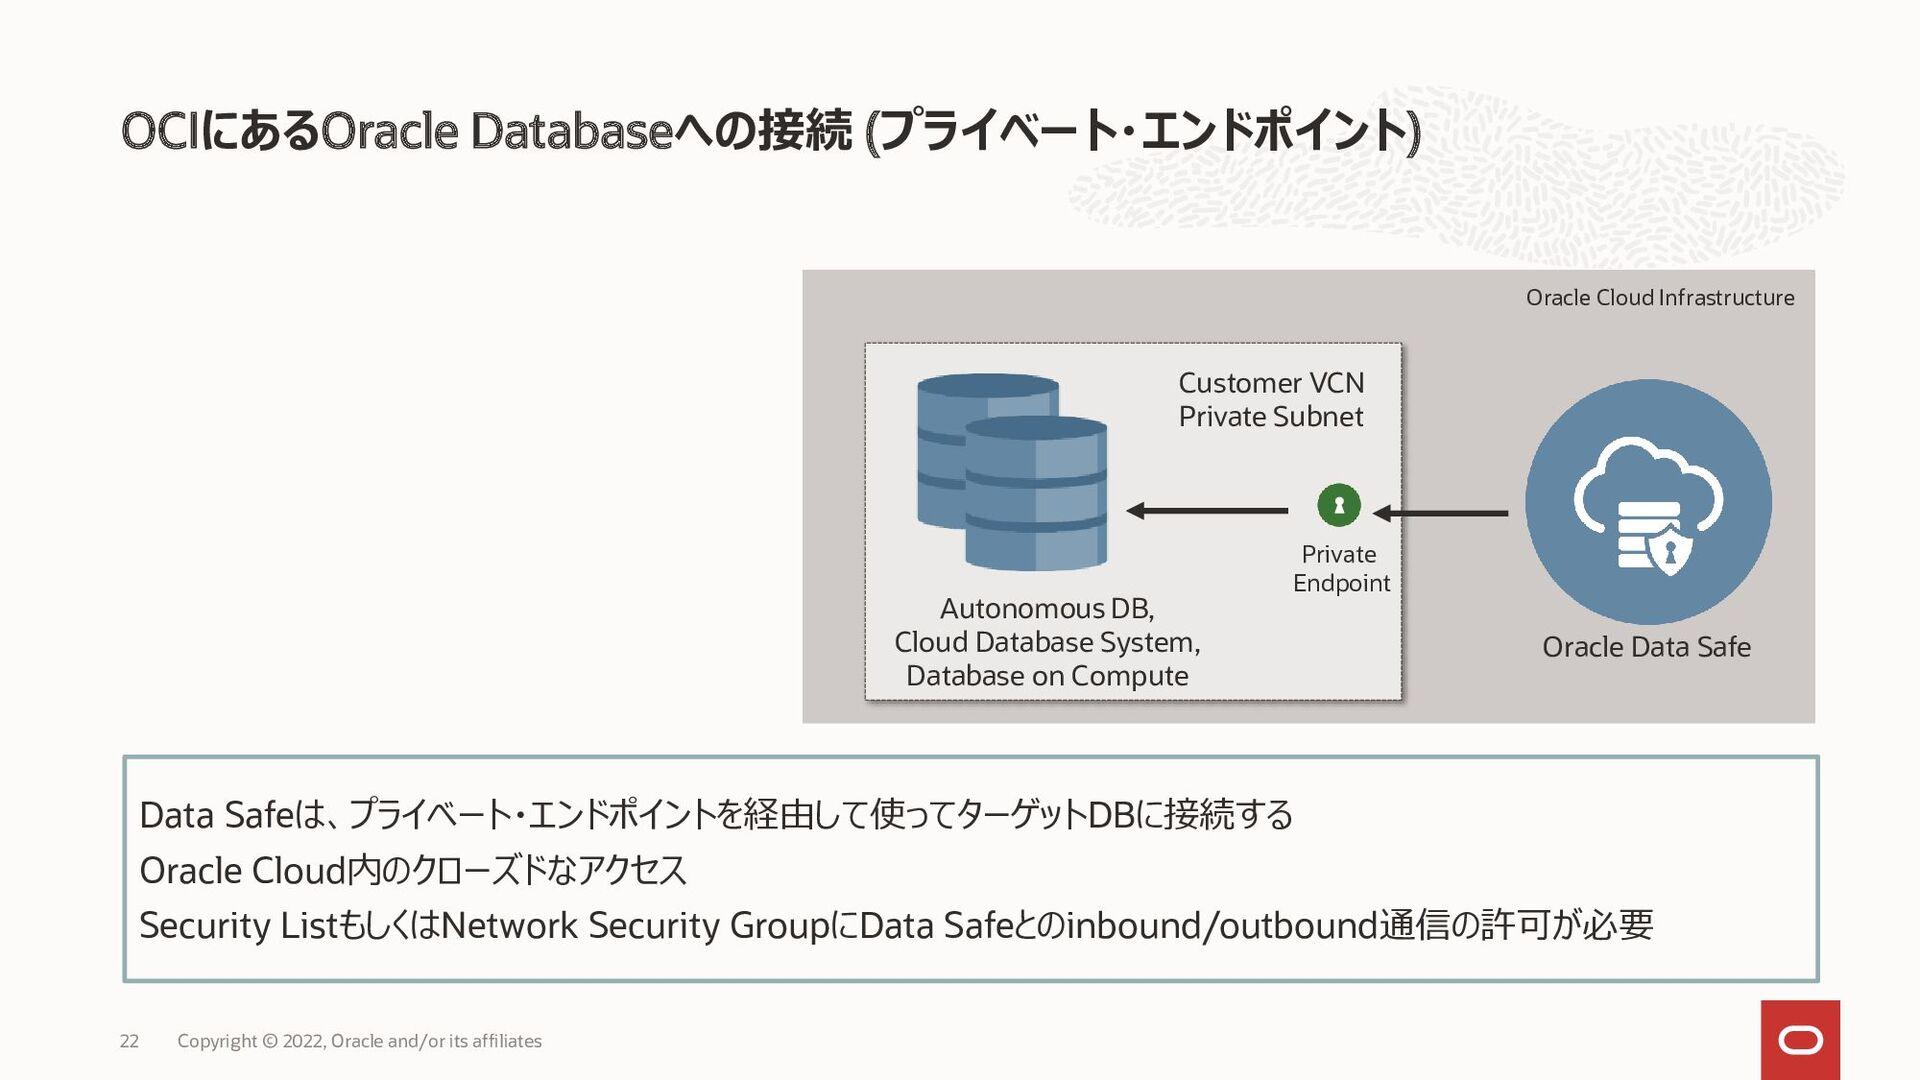 TIPS Oracle Data Safeを有効化する https://qiita.com/w...